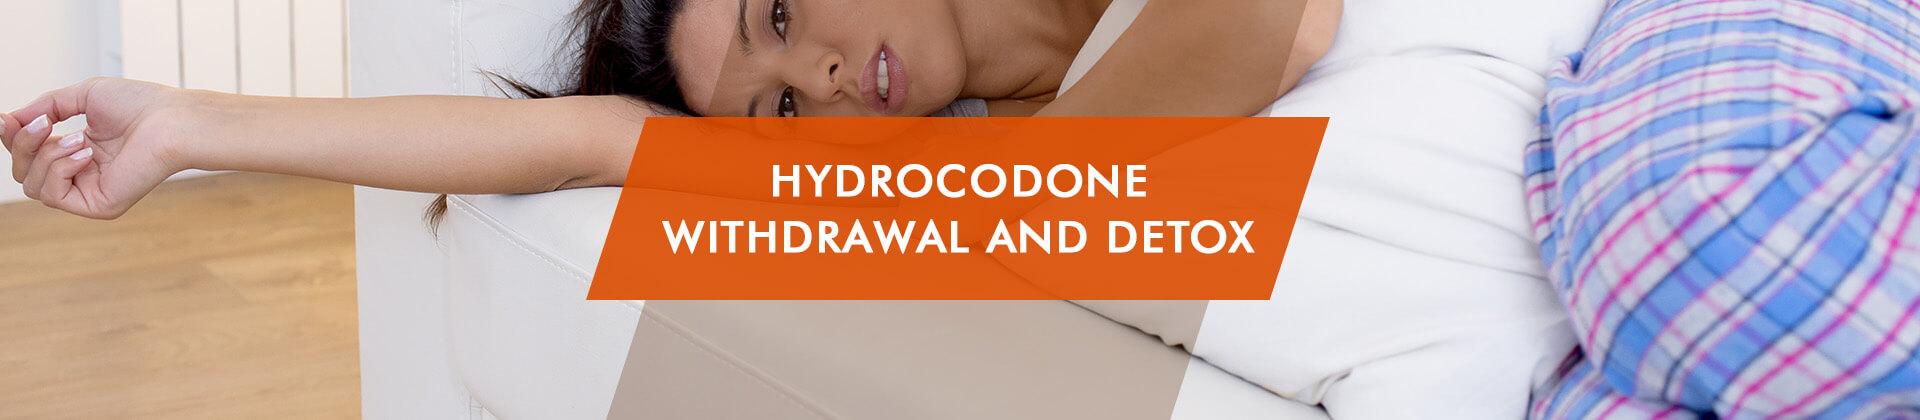 Hydrocodone Withdrawal and Detox